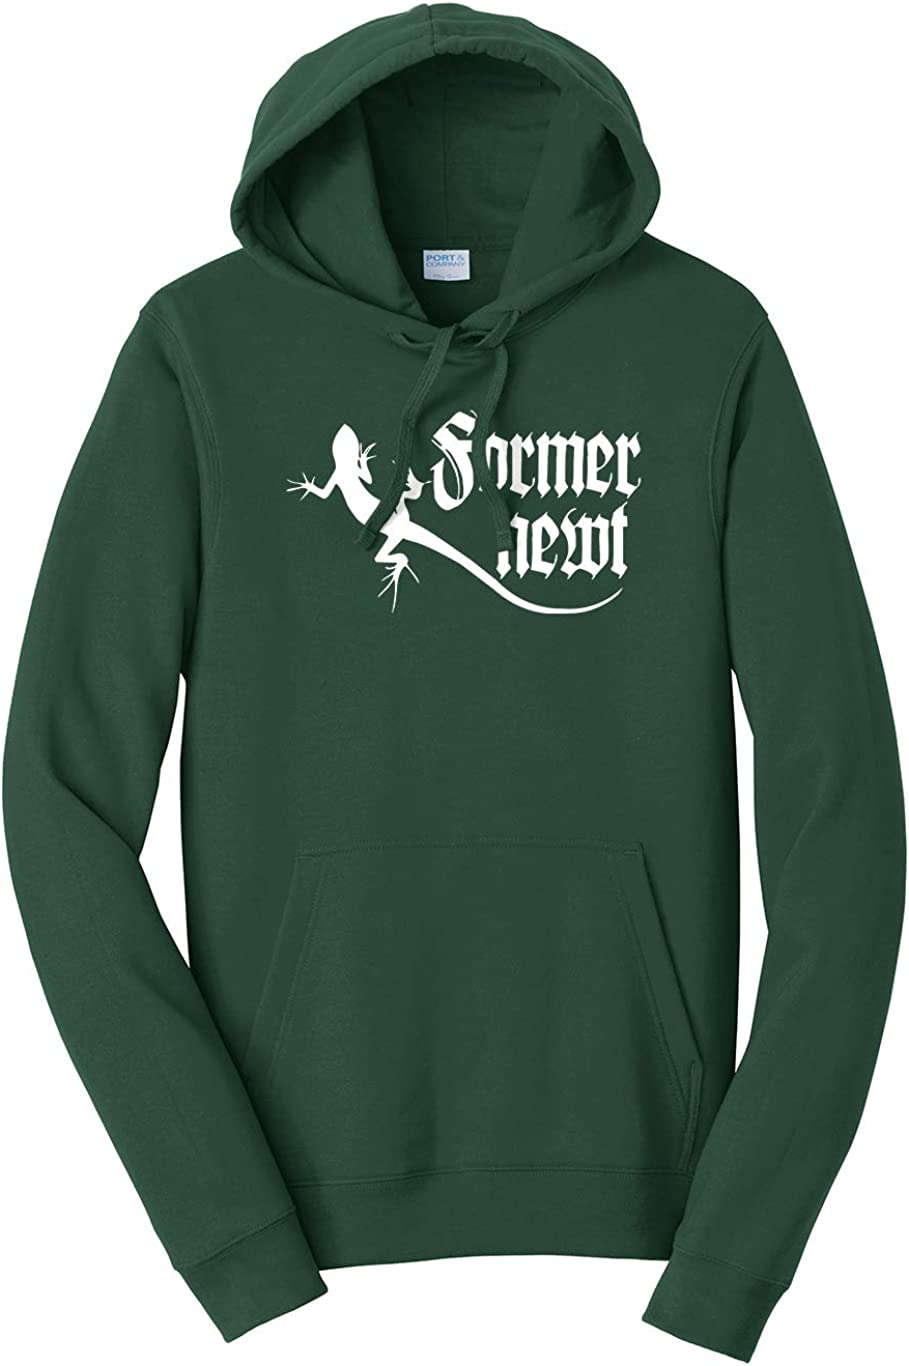 Tenacitee Mens Former Newt Hooded Sweatshirt